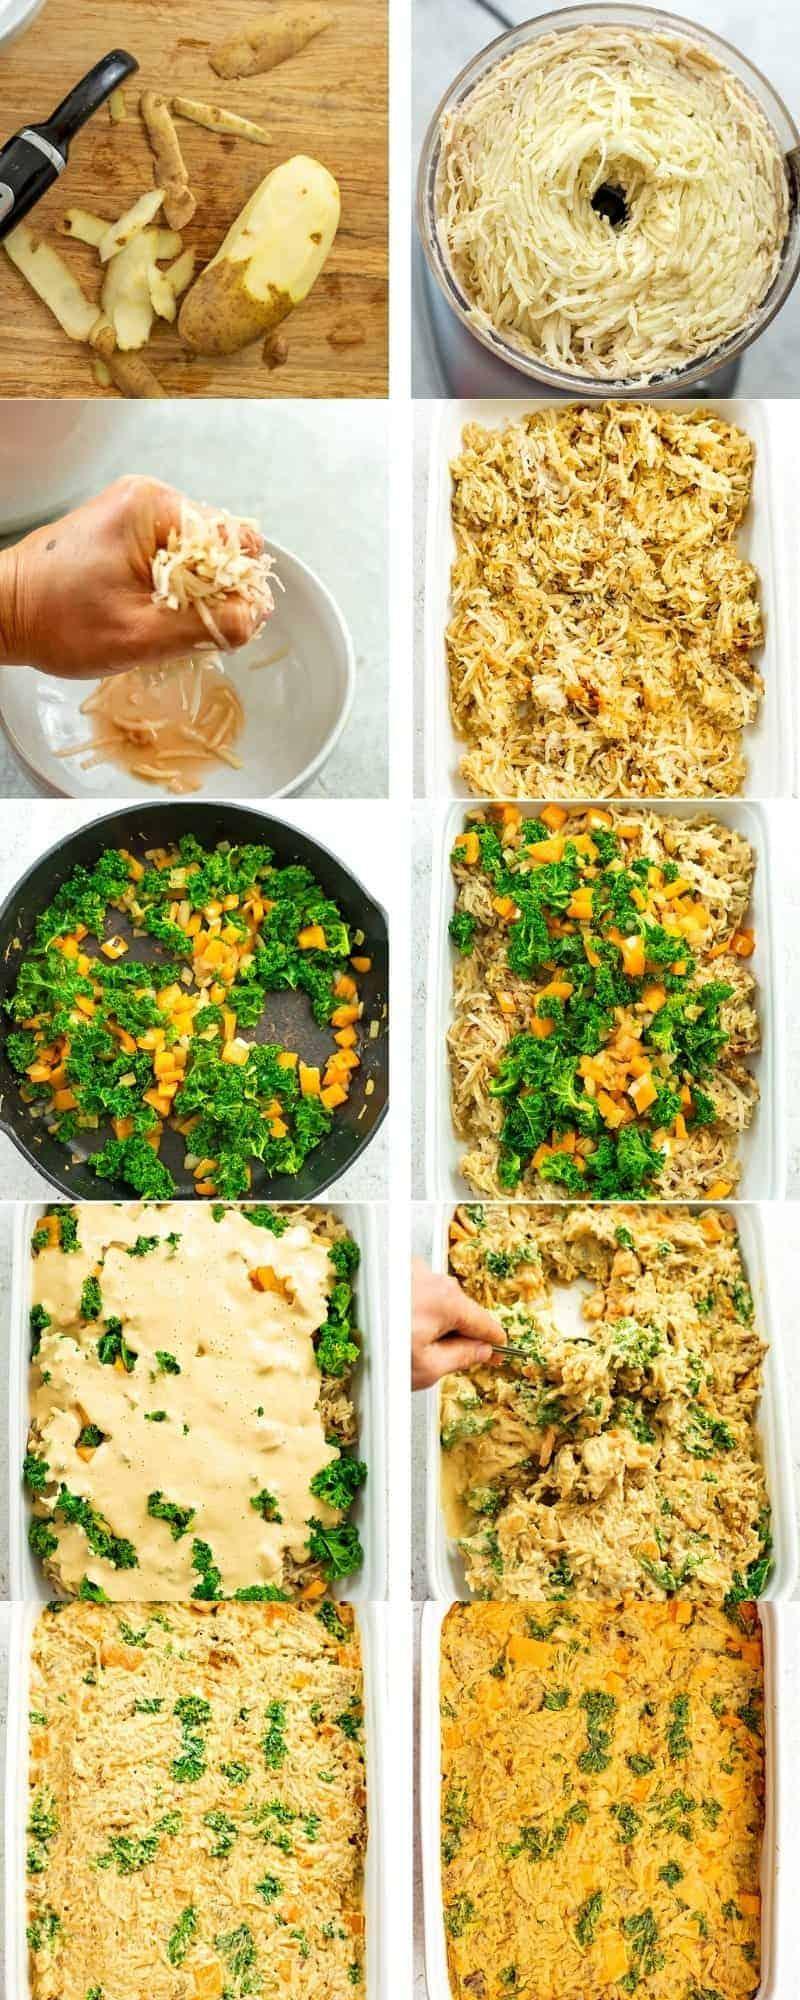 Steps to make vegan hash brown casserole.